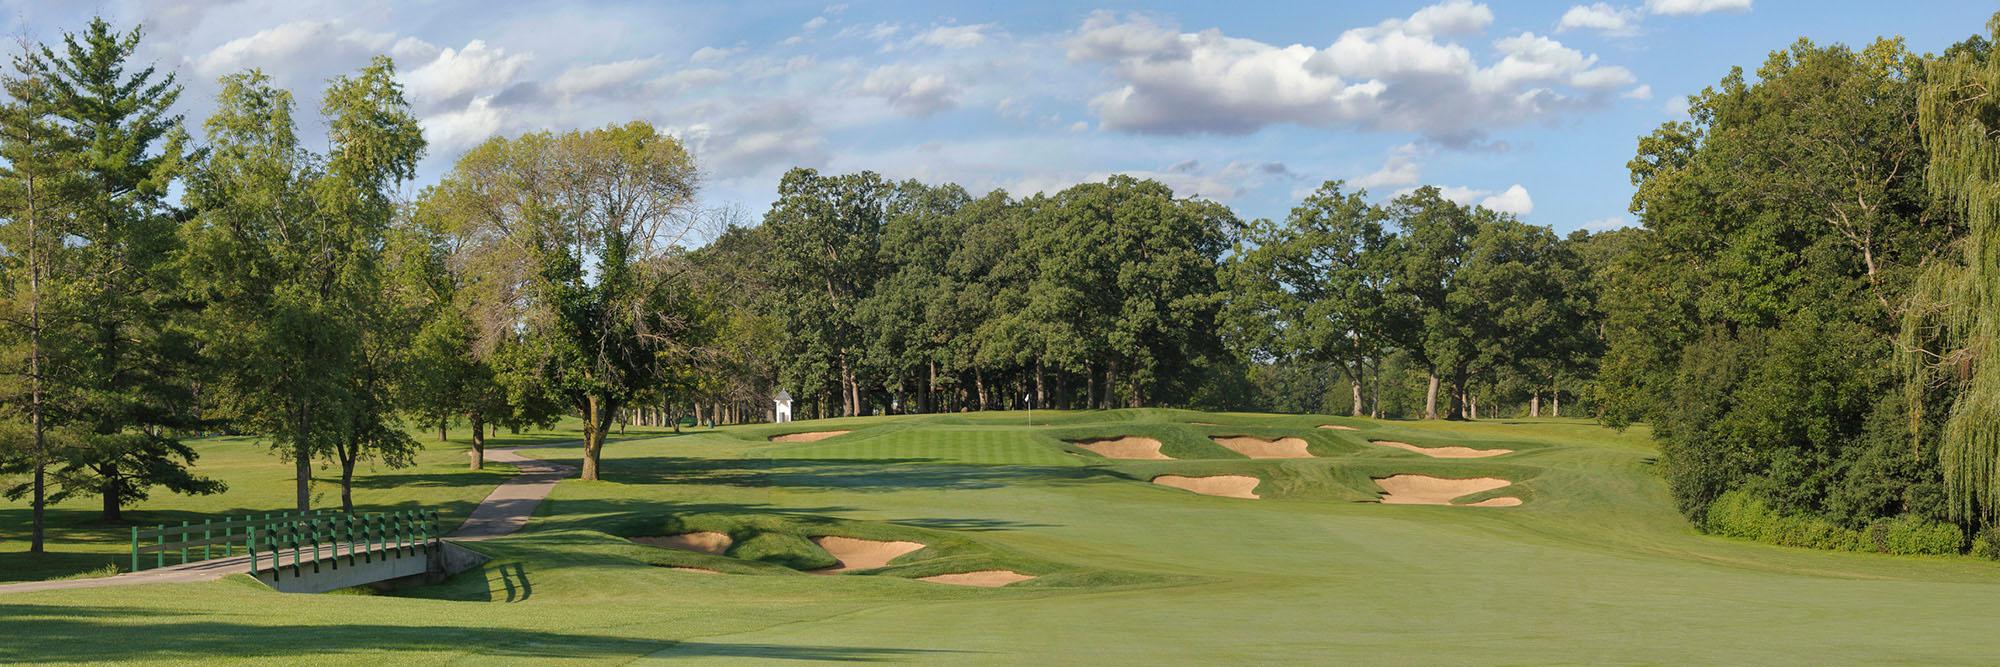 Golf Course Image - Cog Hill 4 No. 8